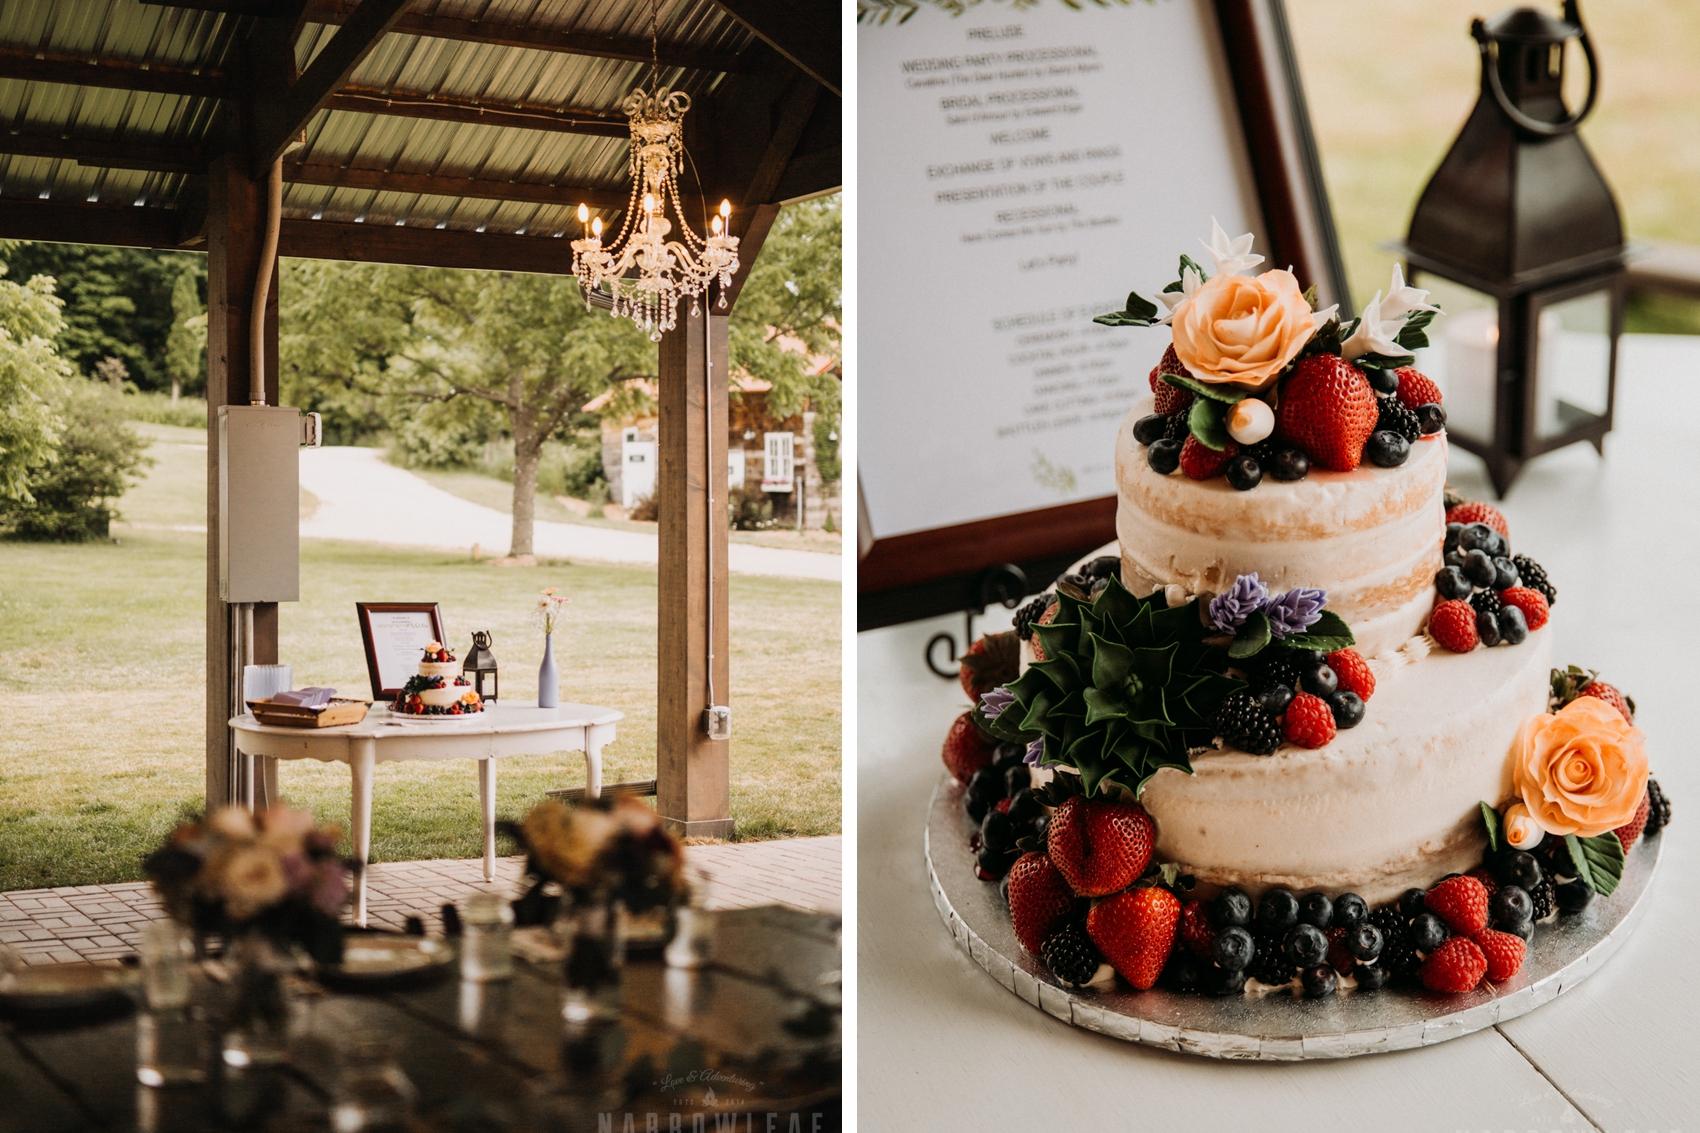 rustic-chic-outdoor-wedding-hidden-meadow-barn-pepin-wi-033-034.jpg